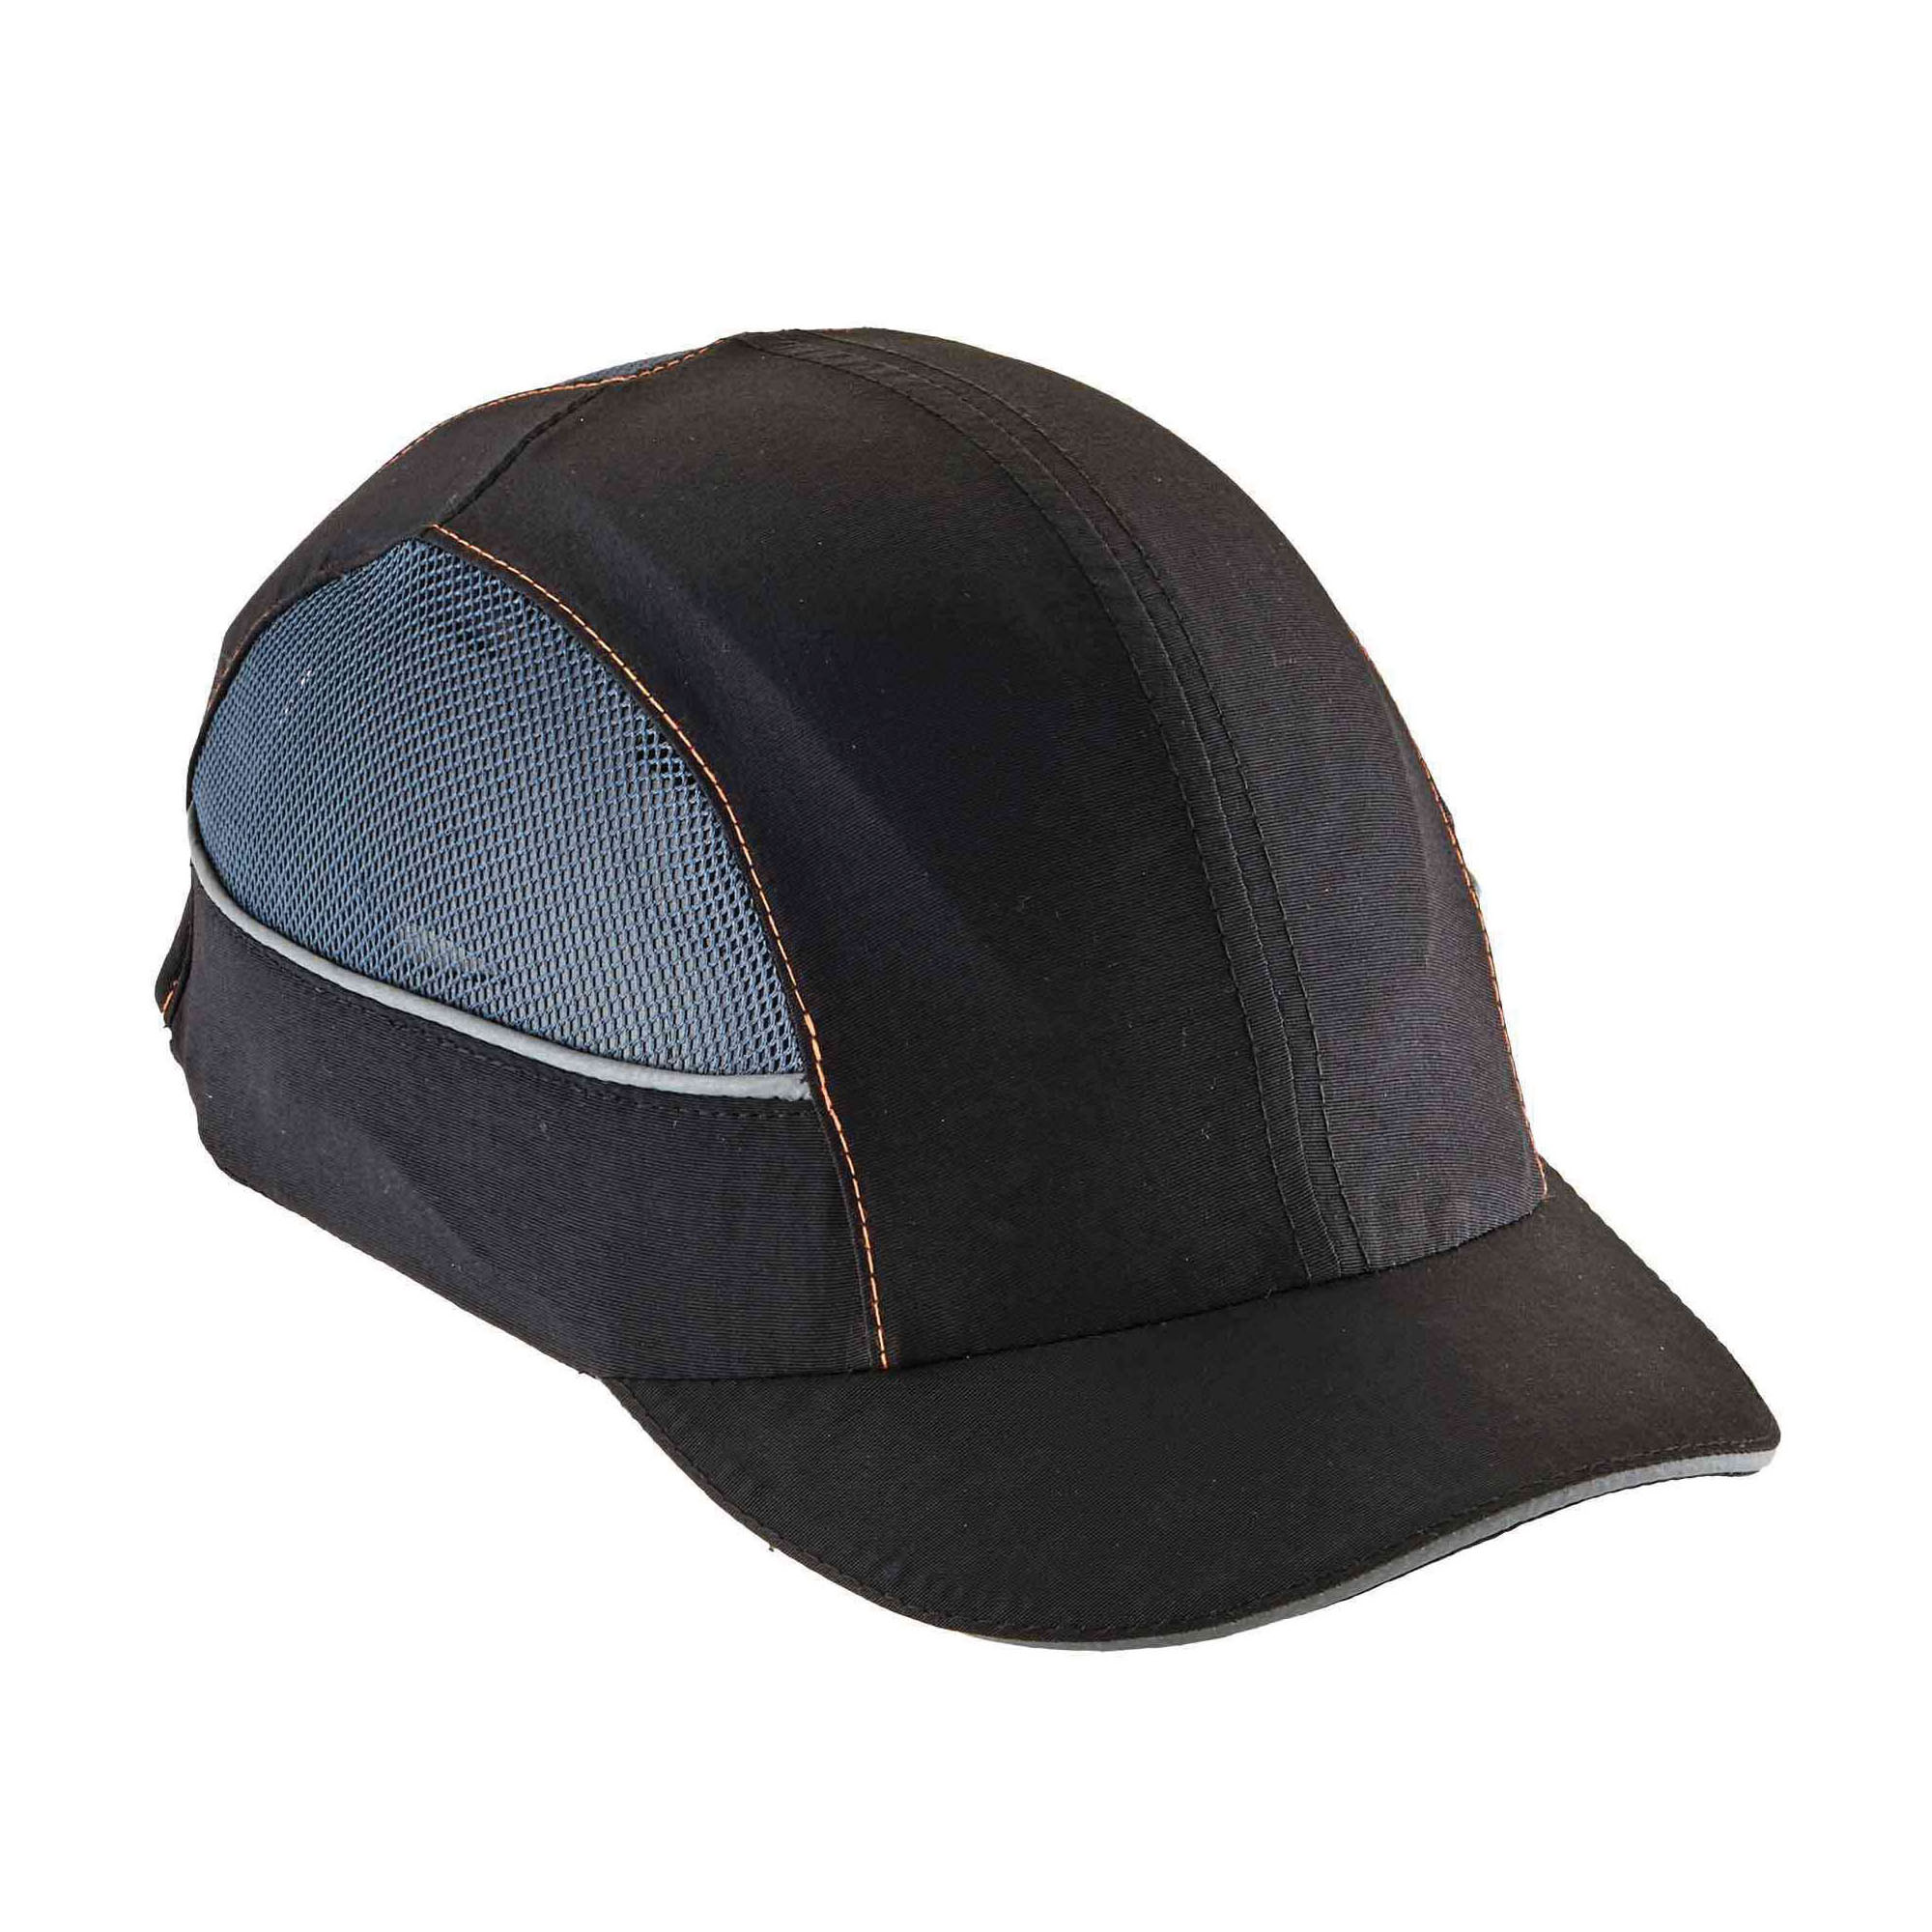 Skullerz® 23349 8950XL Impact Resistant Long Brim Machine Washable Bump Cap, Navy, Nylon, Specifications Met: EN 812